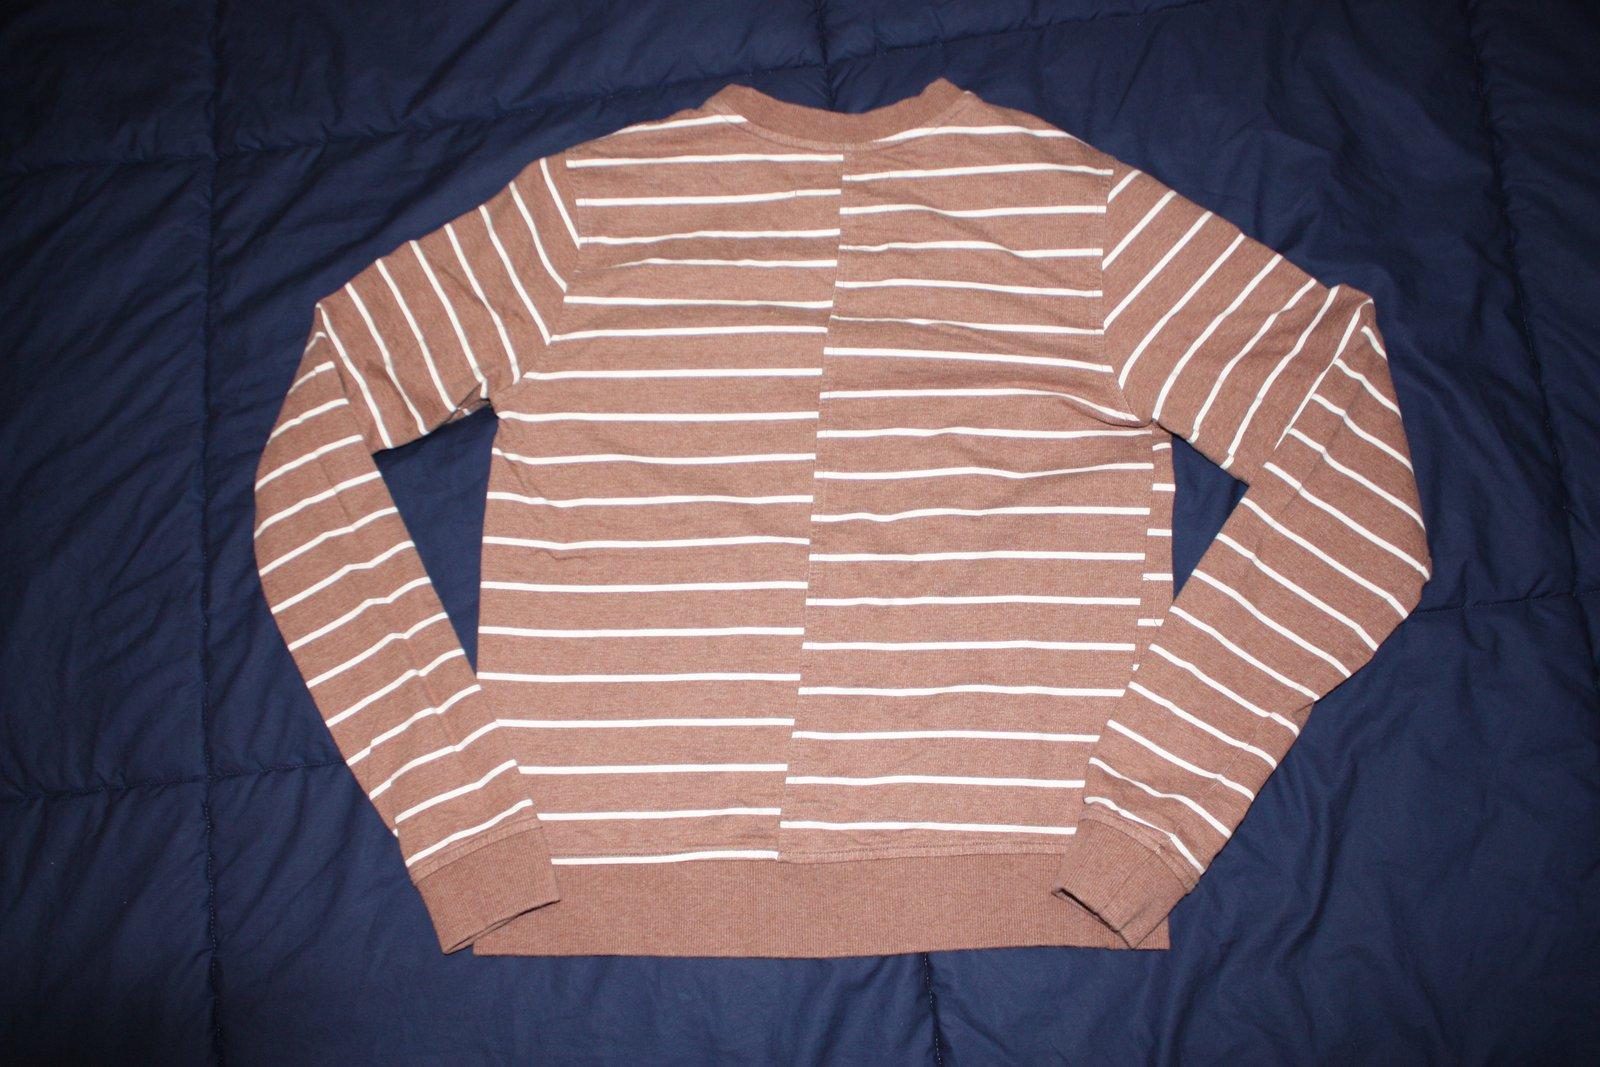 FS: Analog Shirt 1